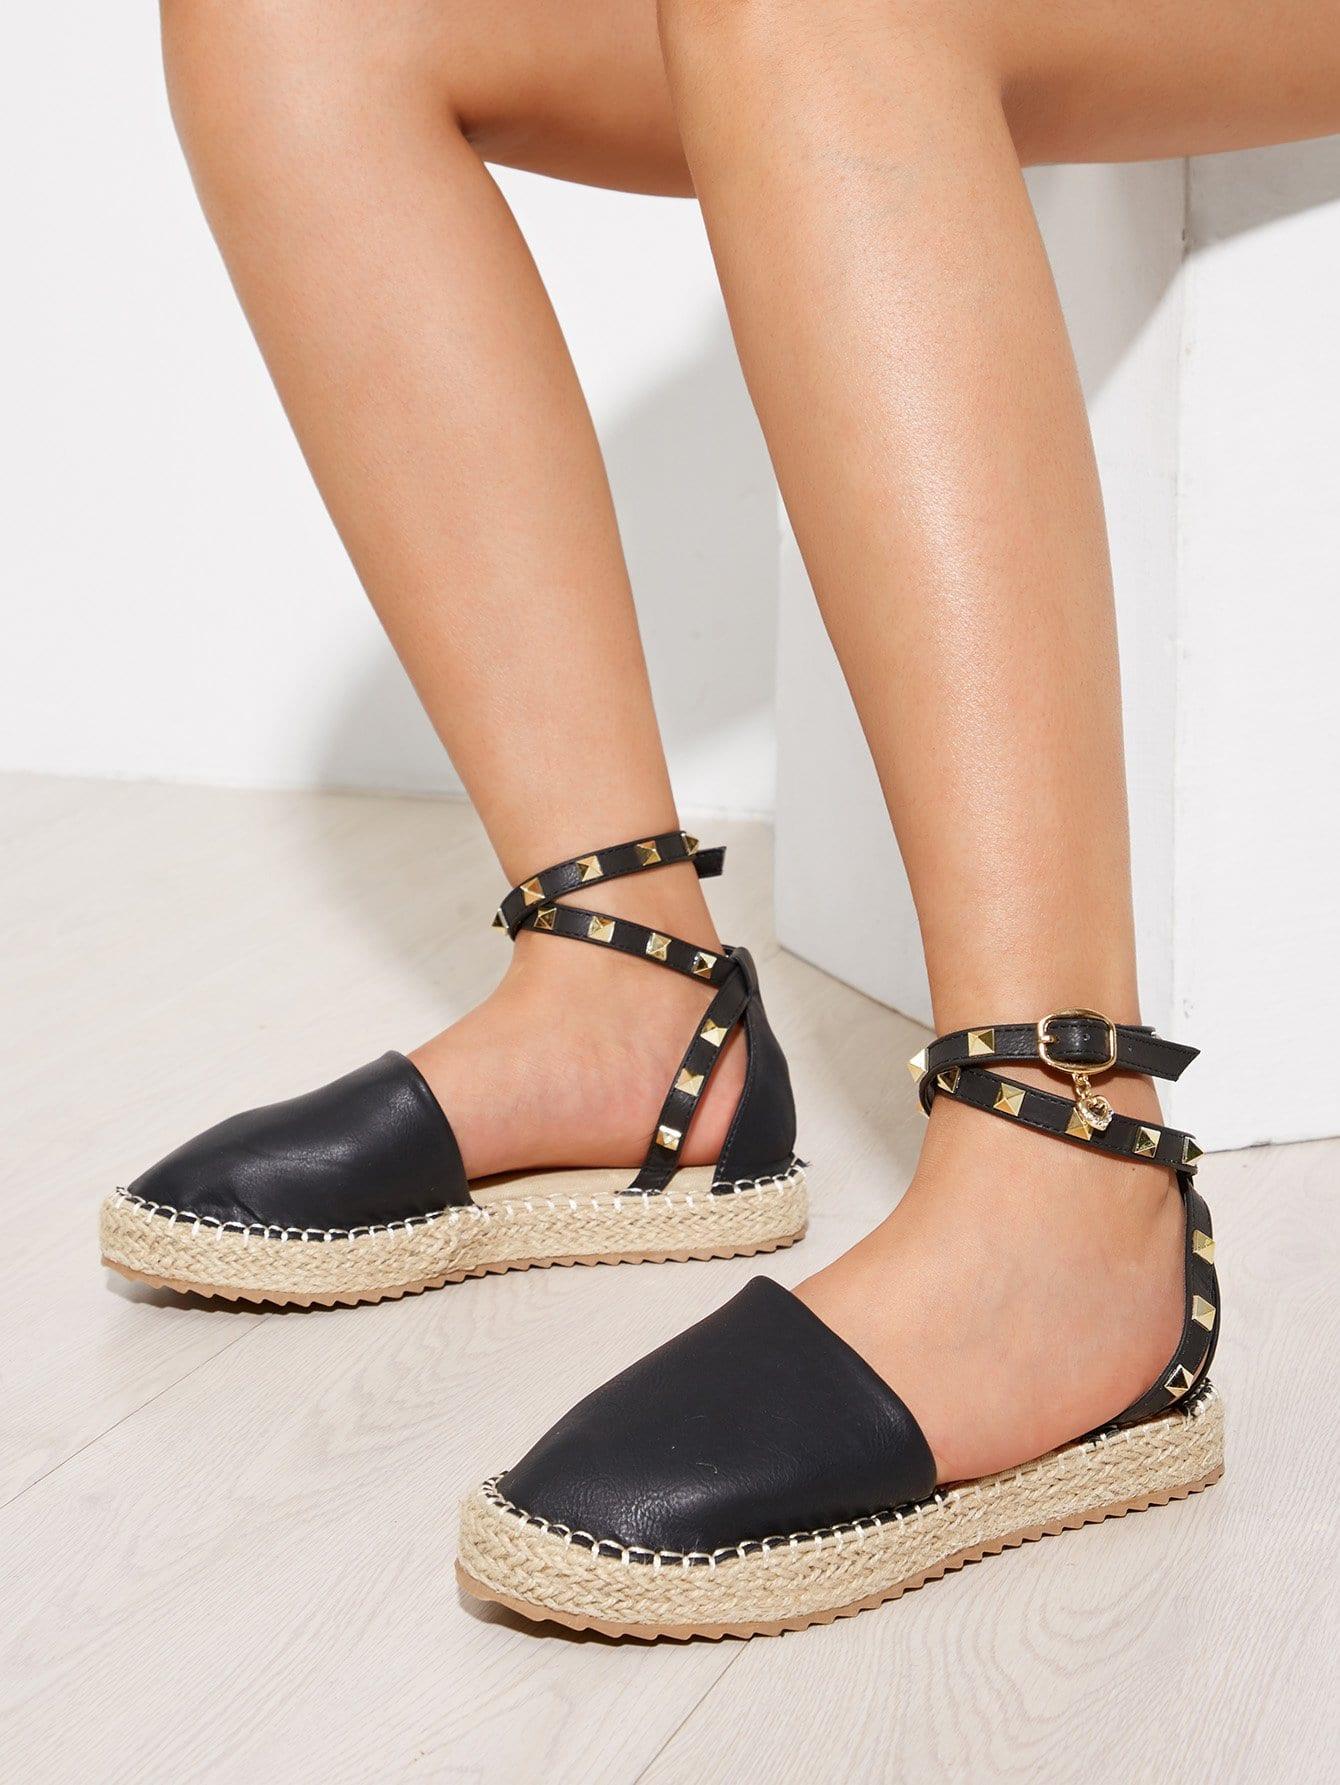 Tie Leg Round Toe PU Flats pointed toe tie leg flats